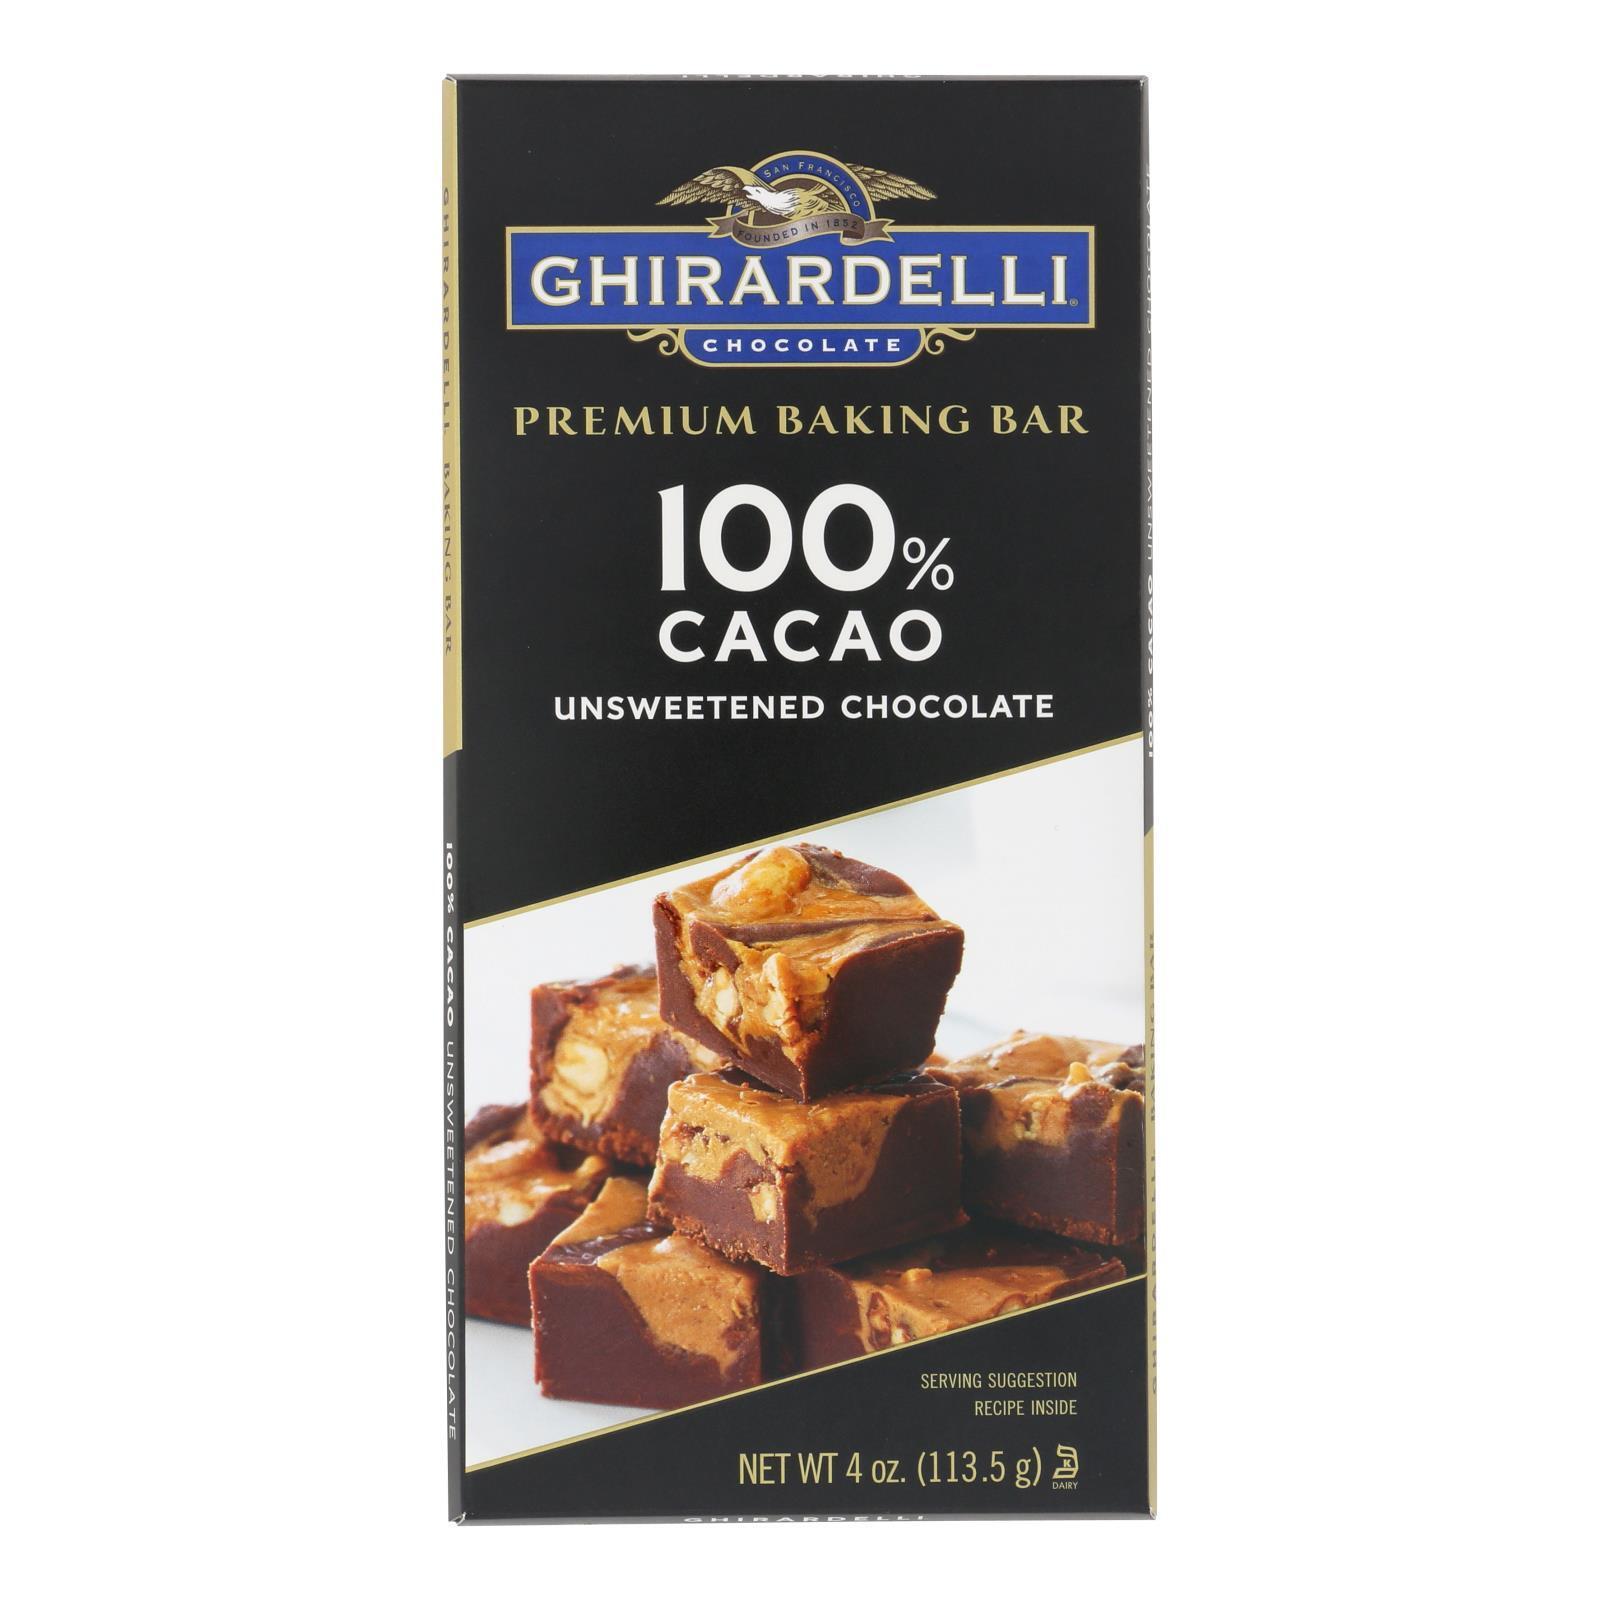 Ghirardelli Premium Baking Bar - 100% Cacao Unsweetened Chocolate - Case of 12 - 4 oz